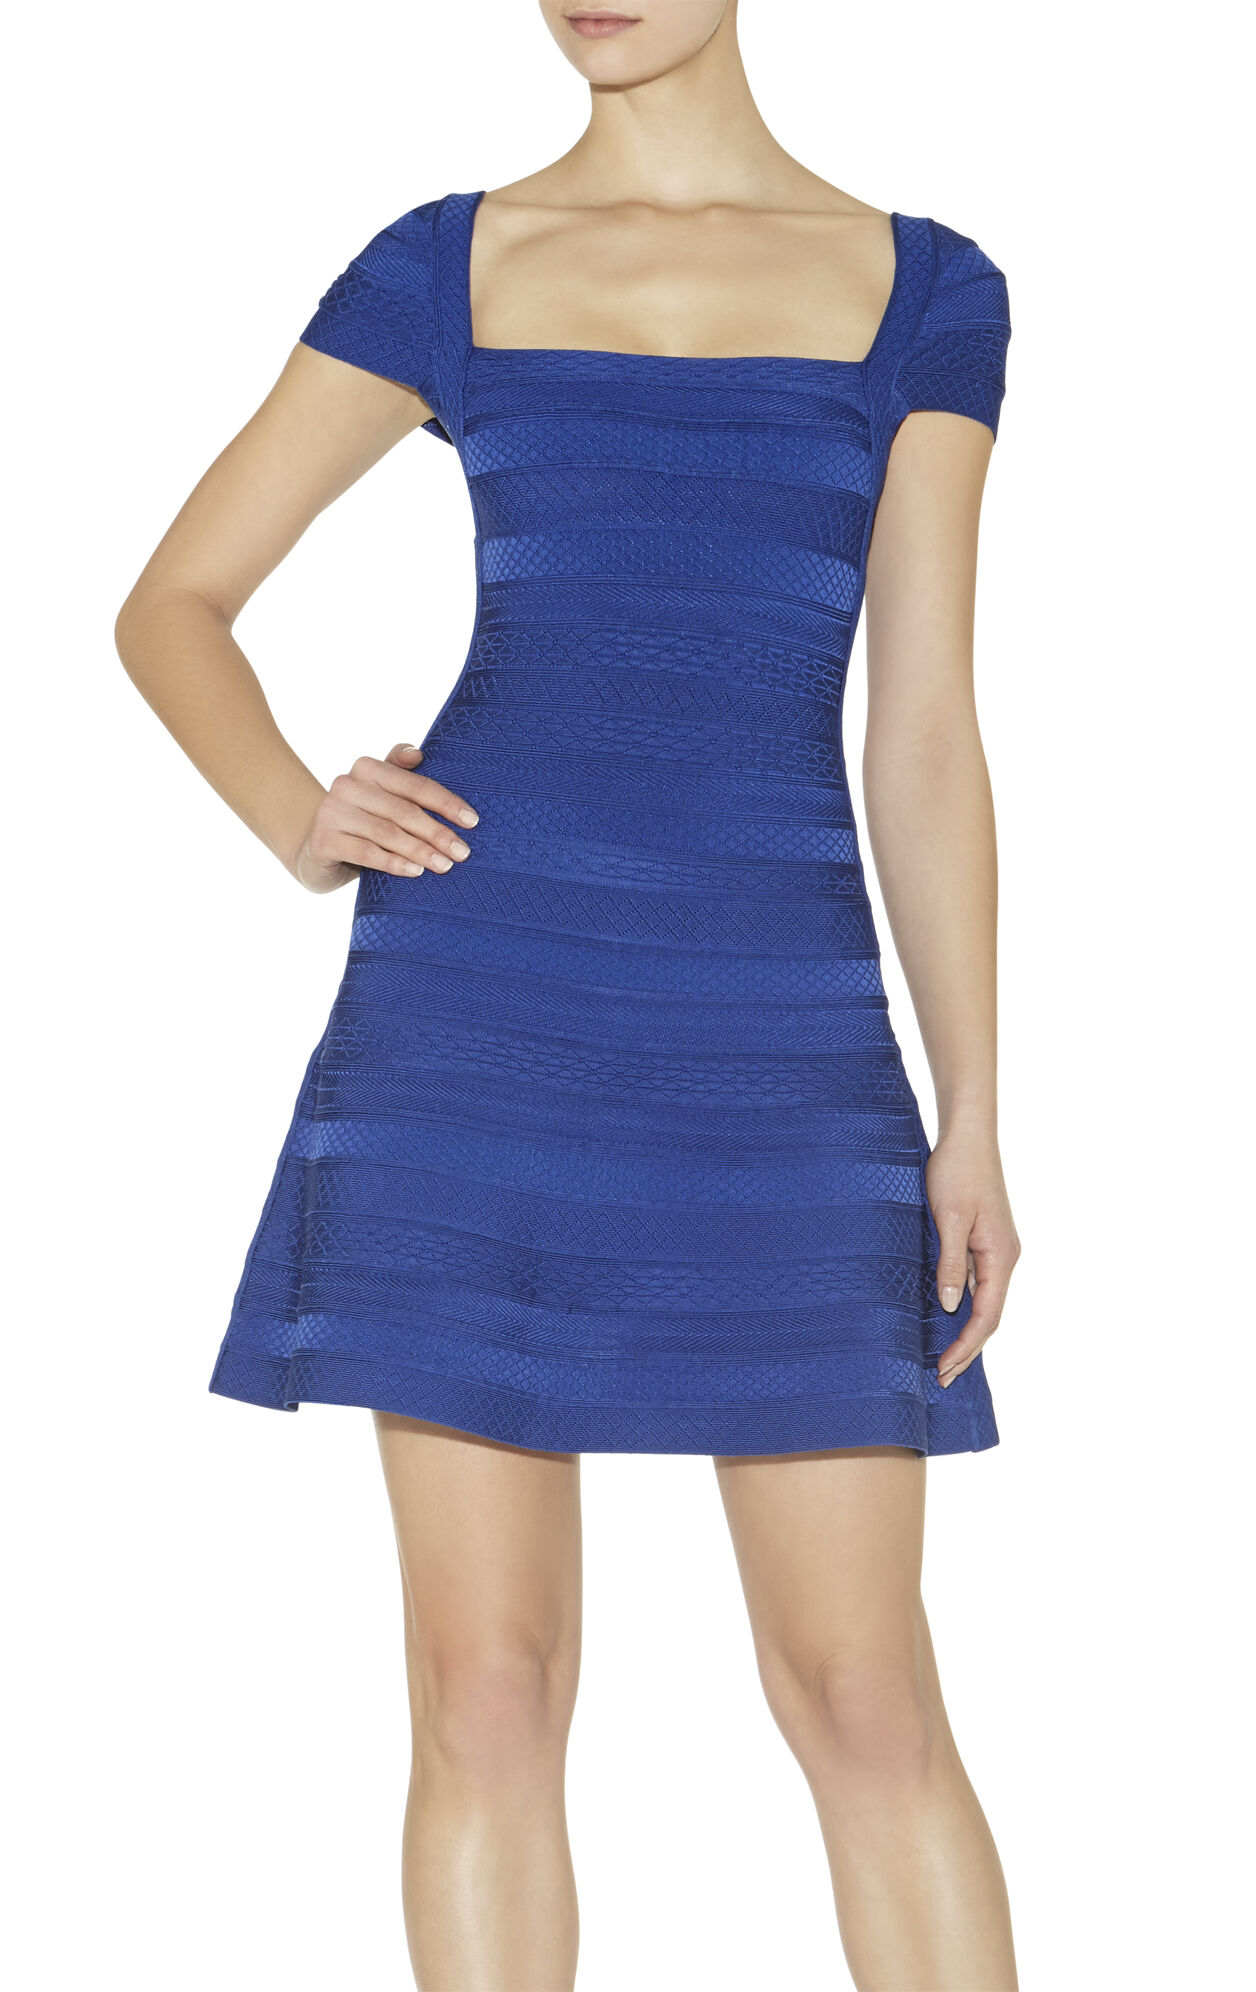 Makayla Embossed-Texture Dress